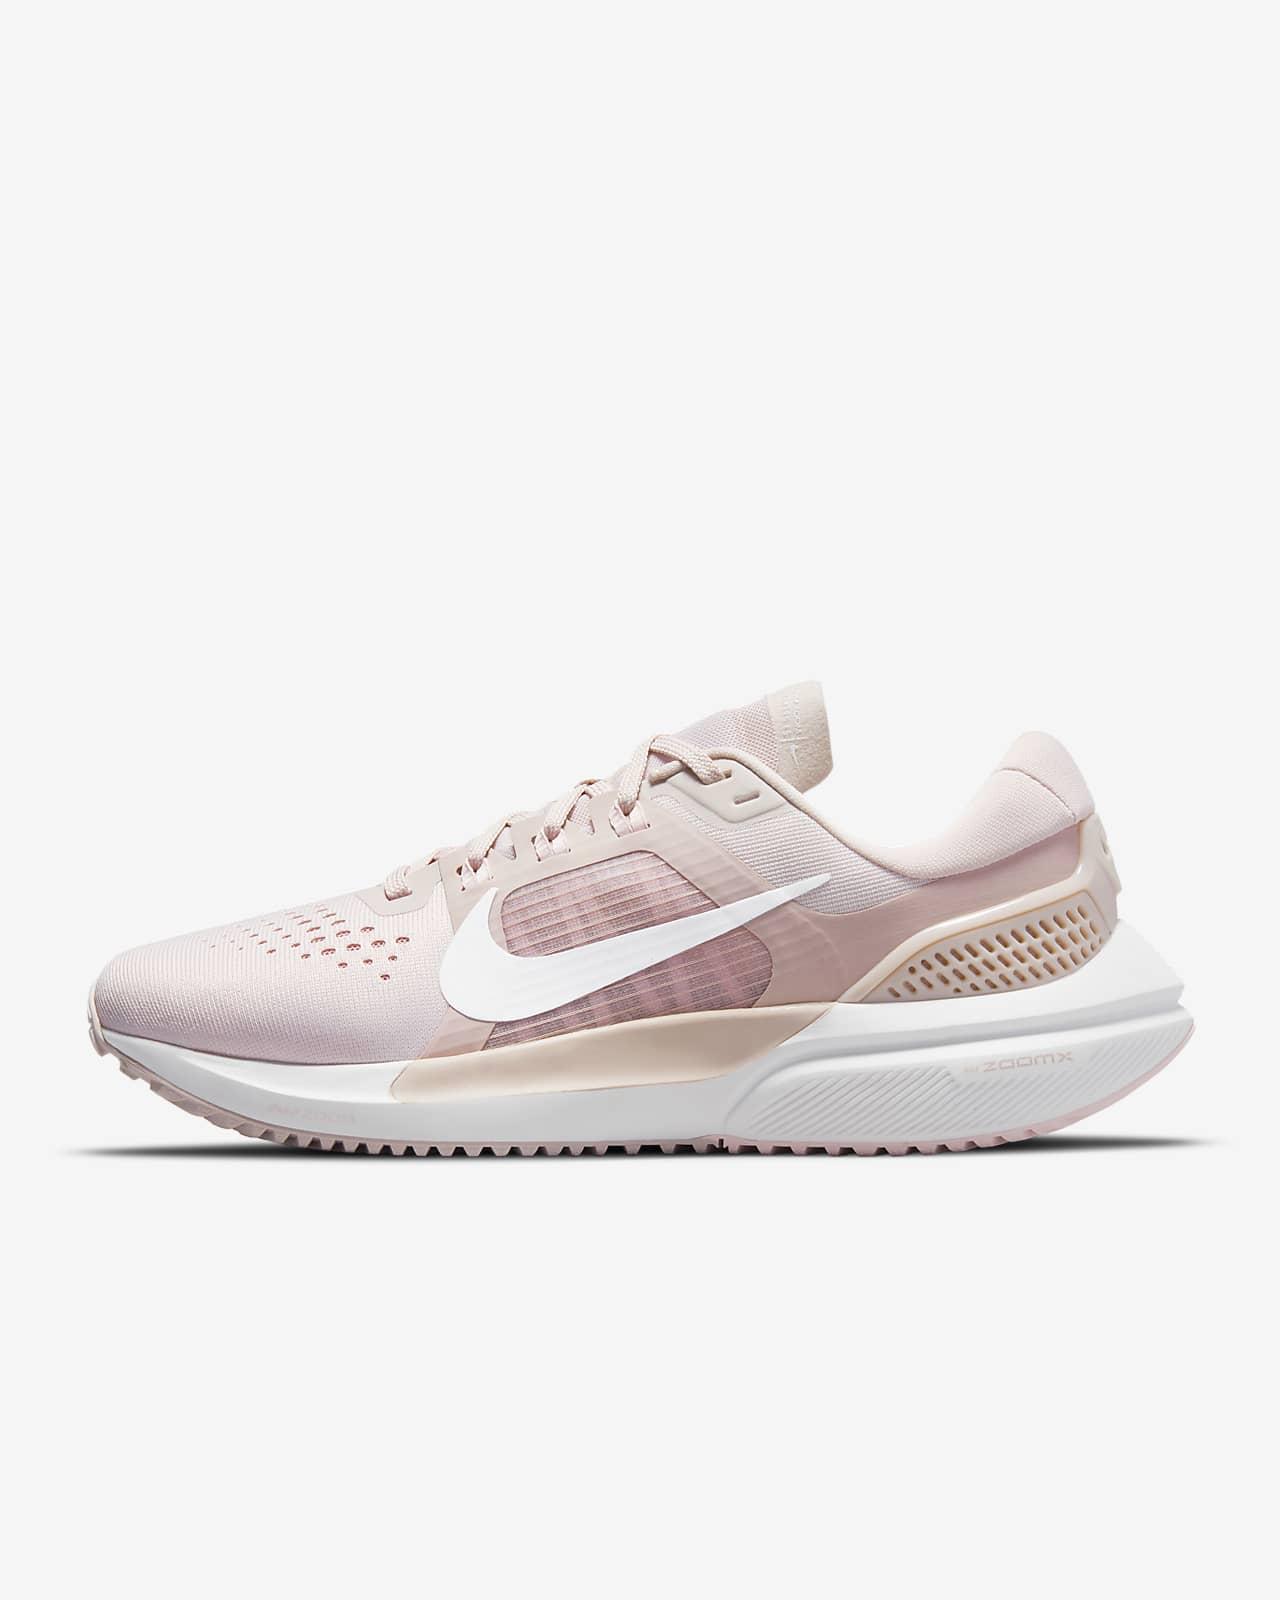 Scarpa da running Nike Air Zoom Vomero 15 - Donna